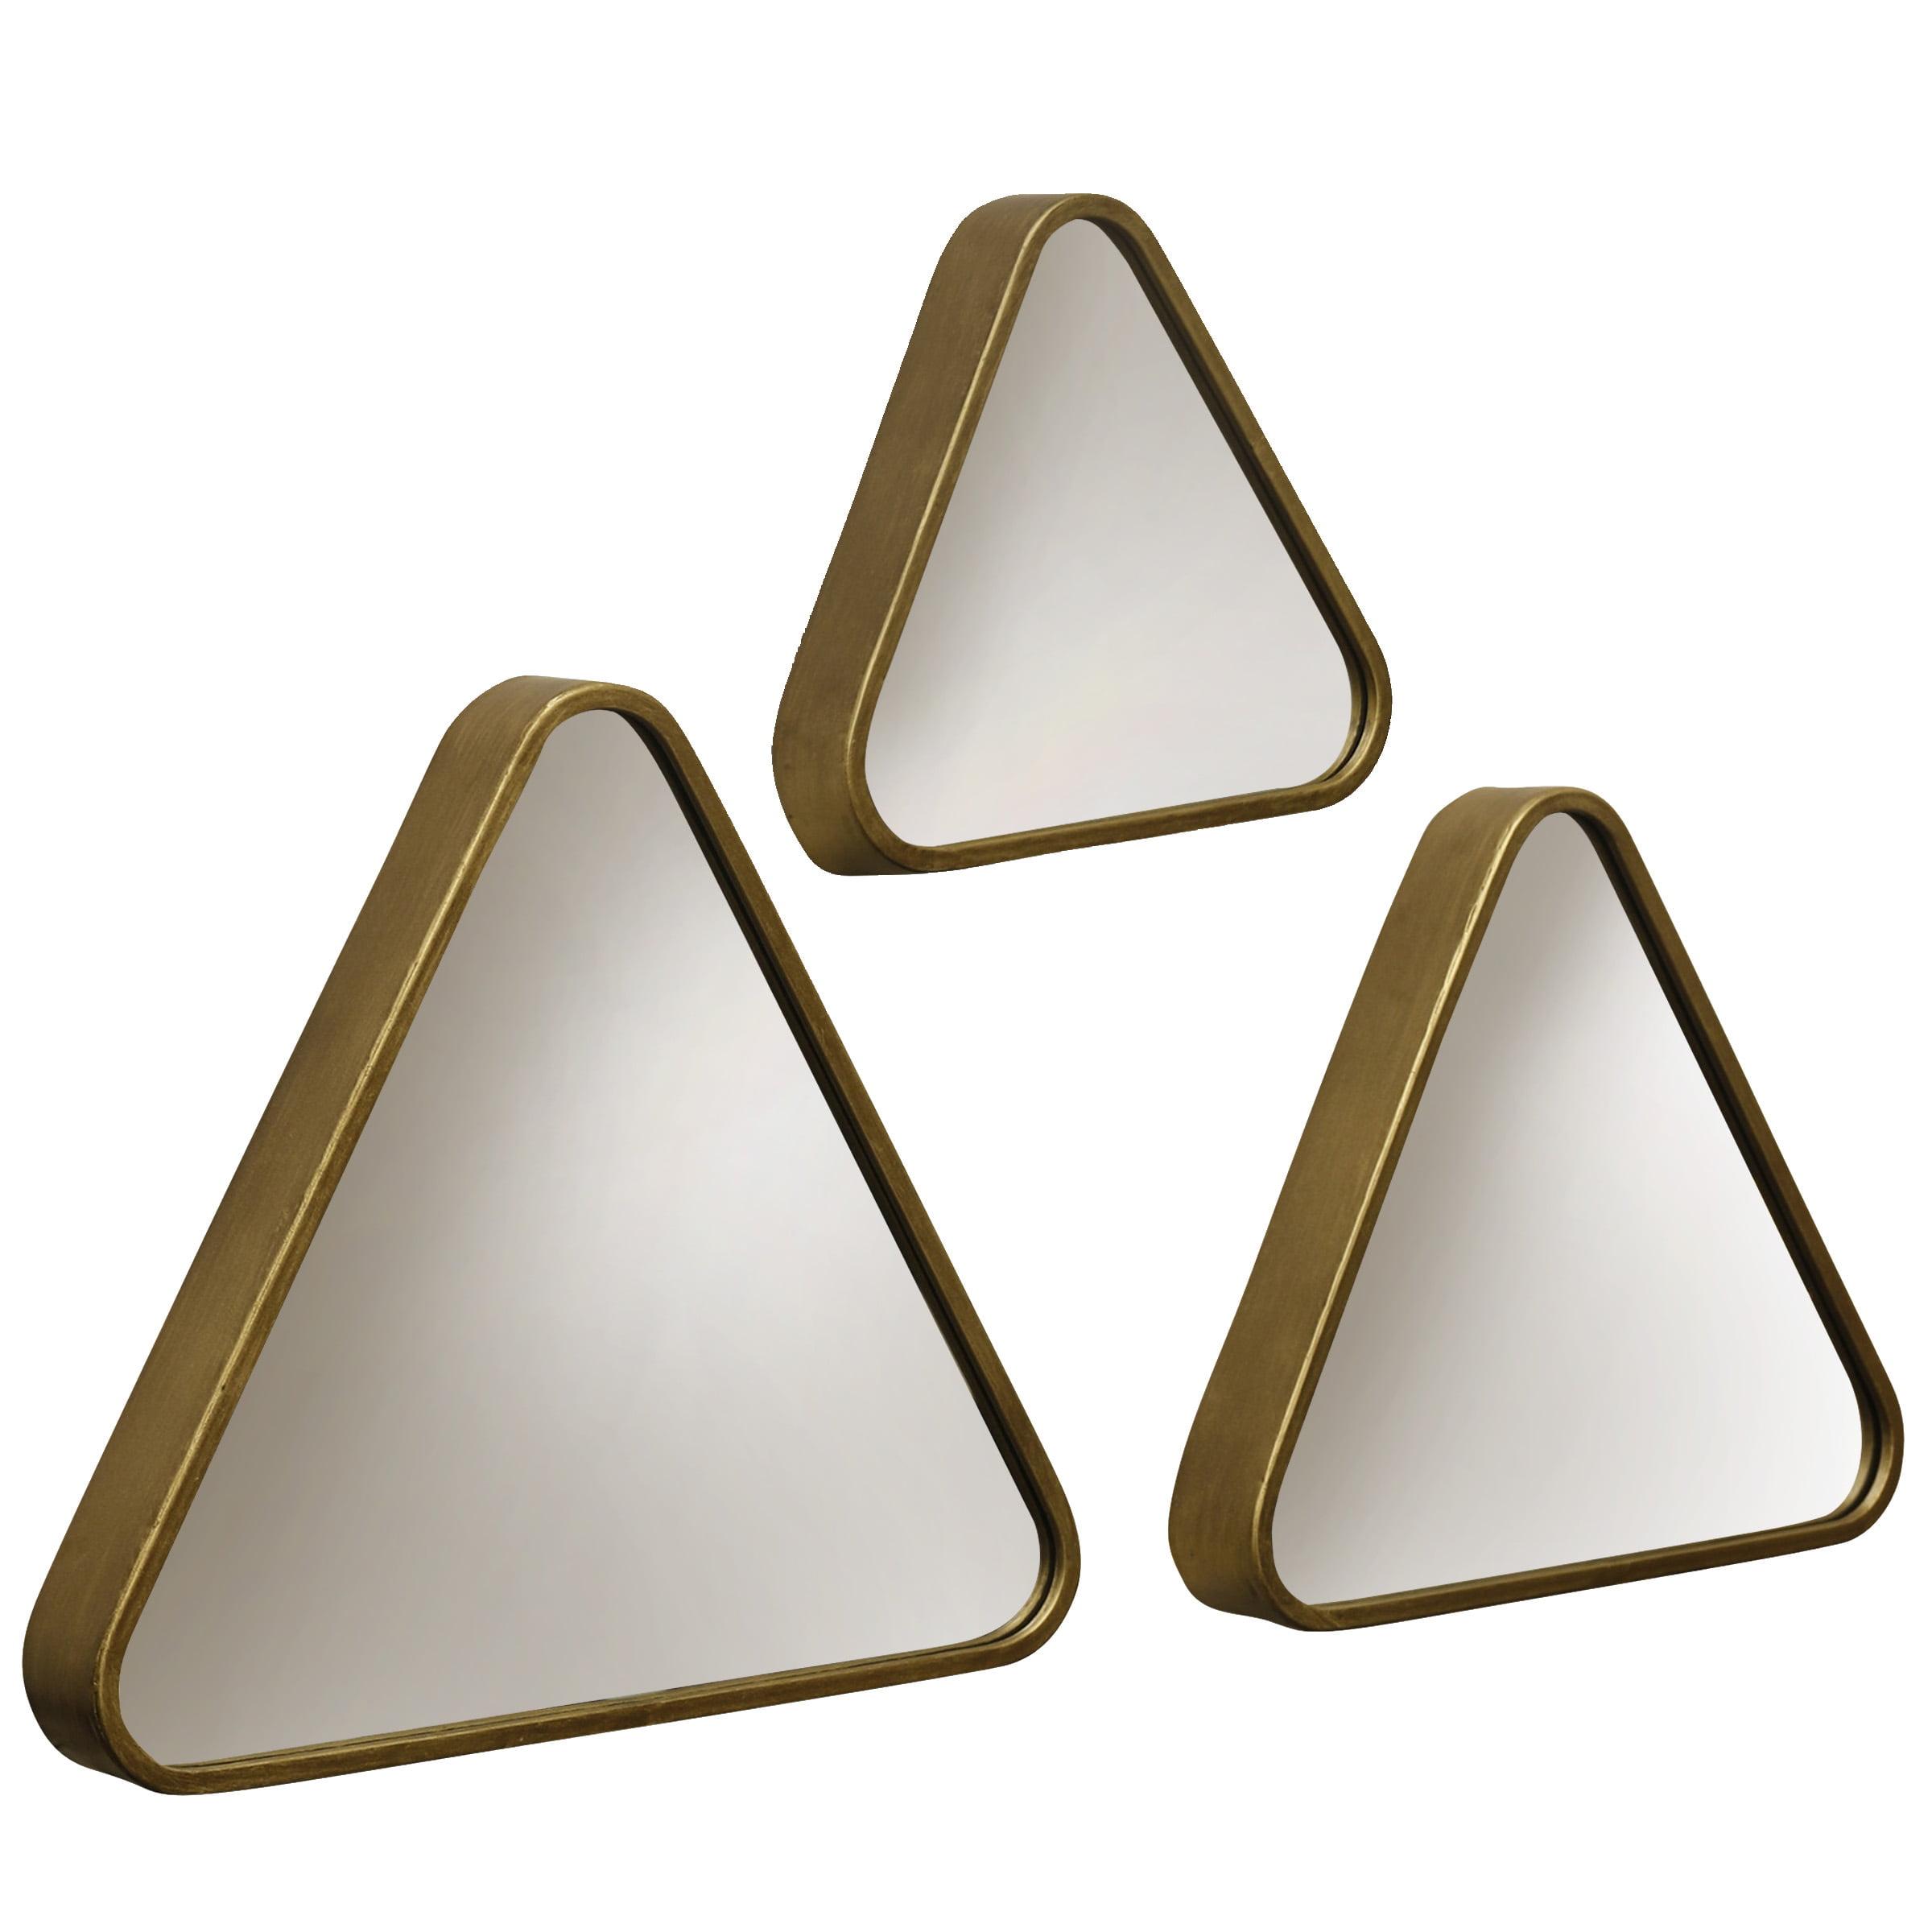 Triangular Framed Wall Mirrors - Gold - Set of 3